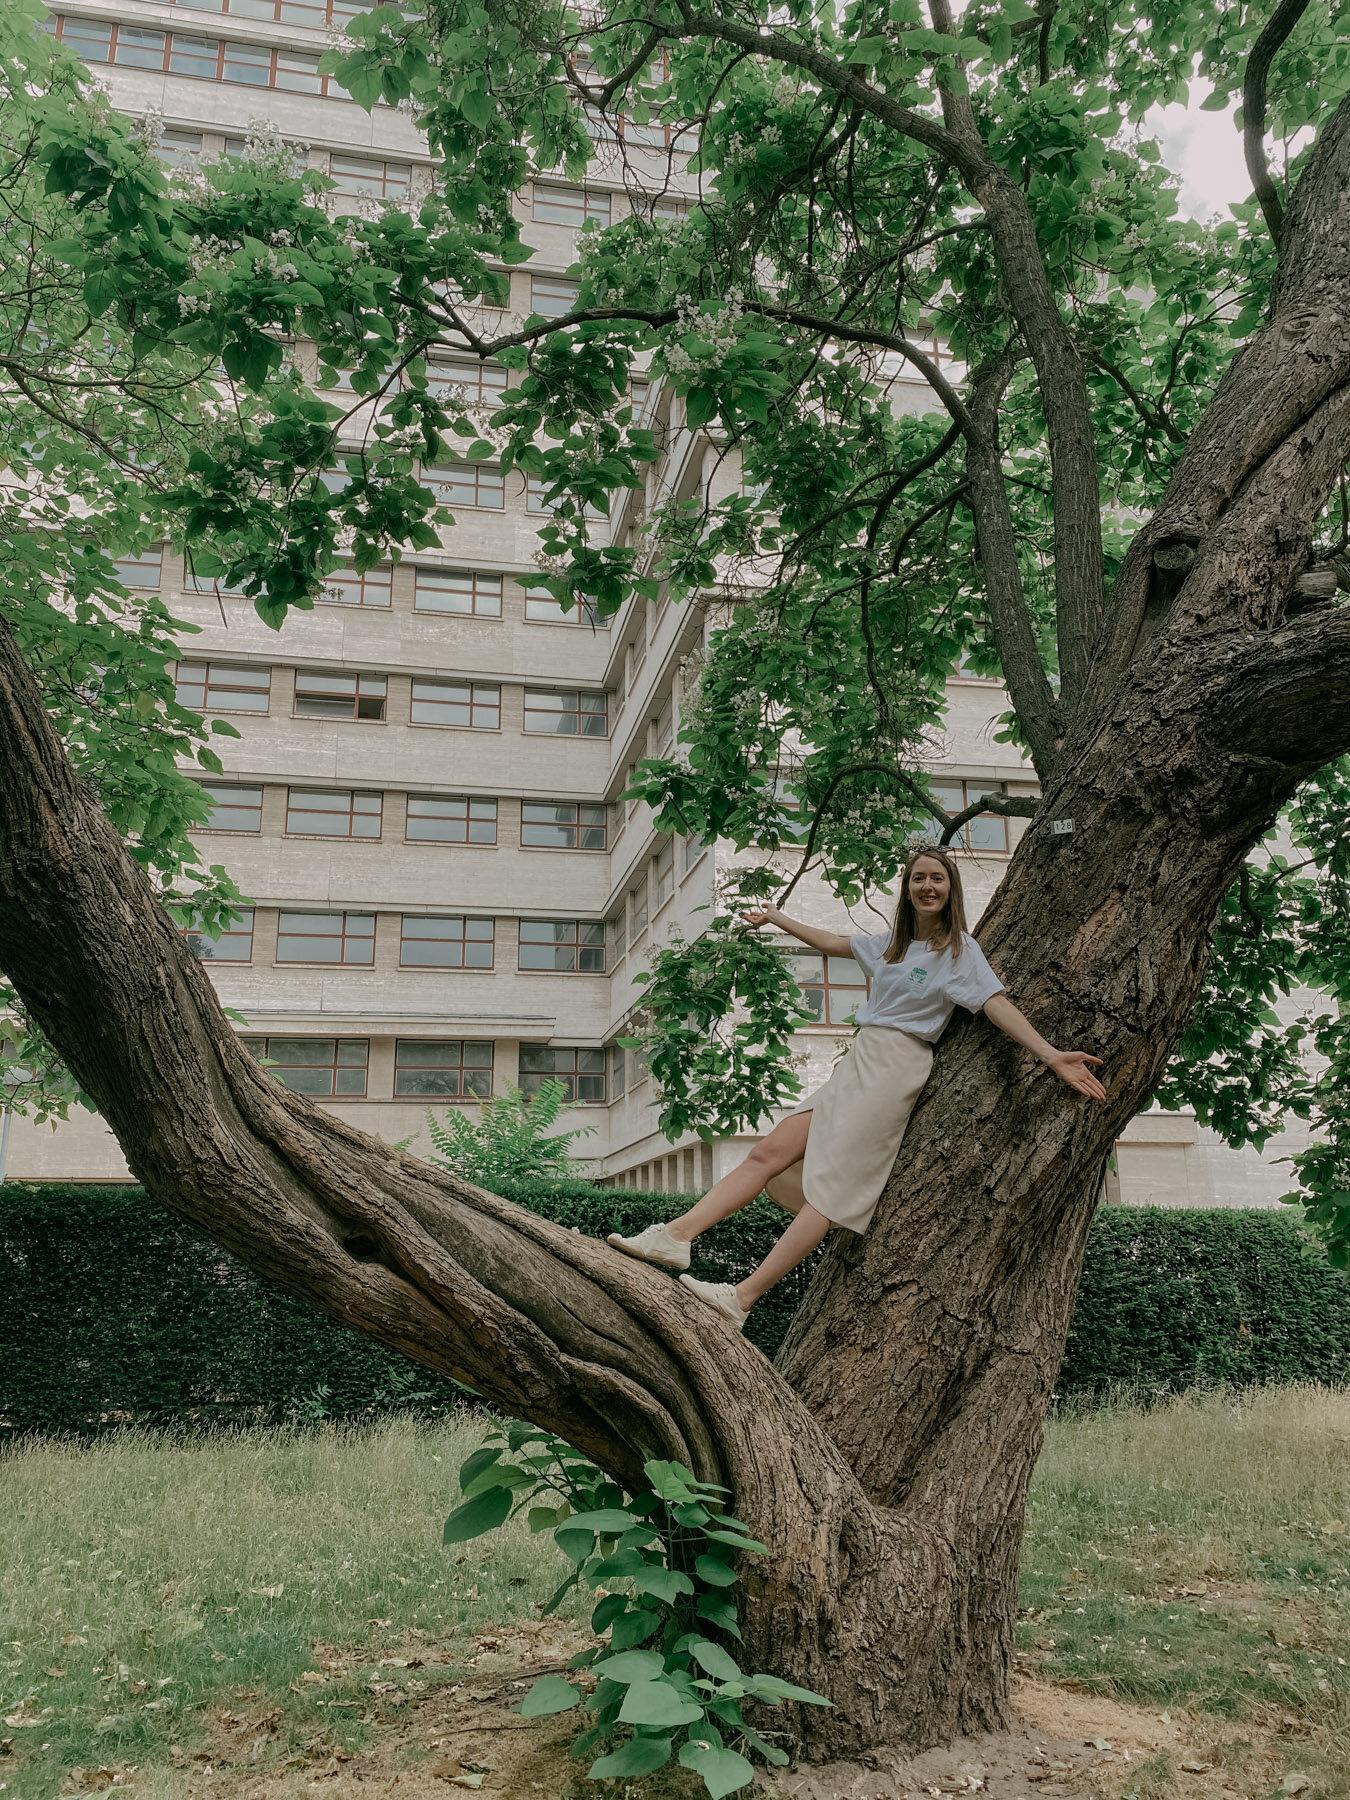 wildling-tree-Biodifications-sustainable-3.jpg